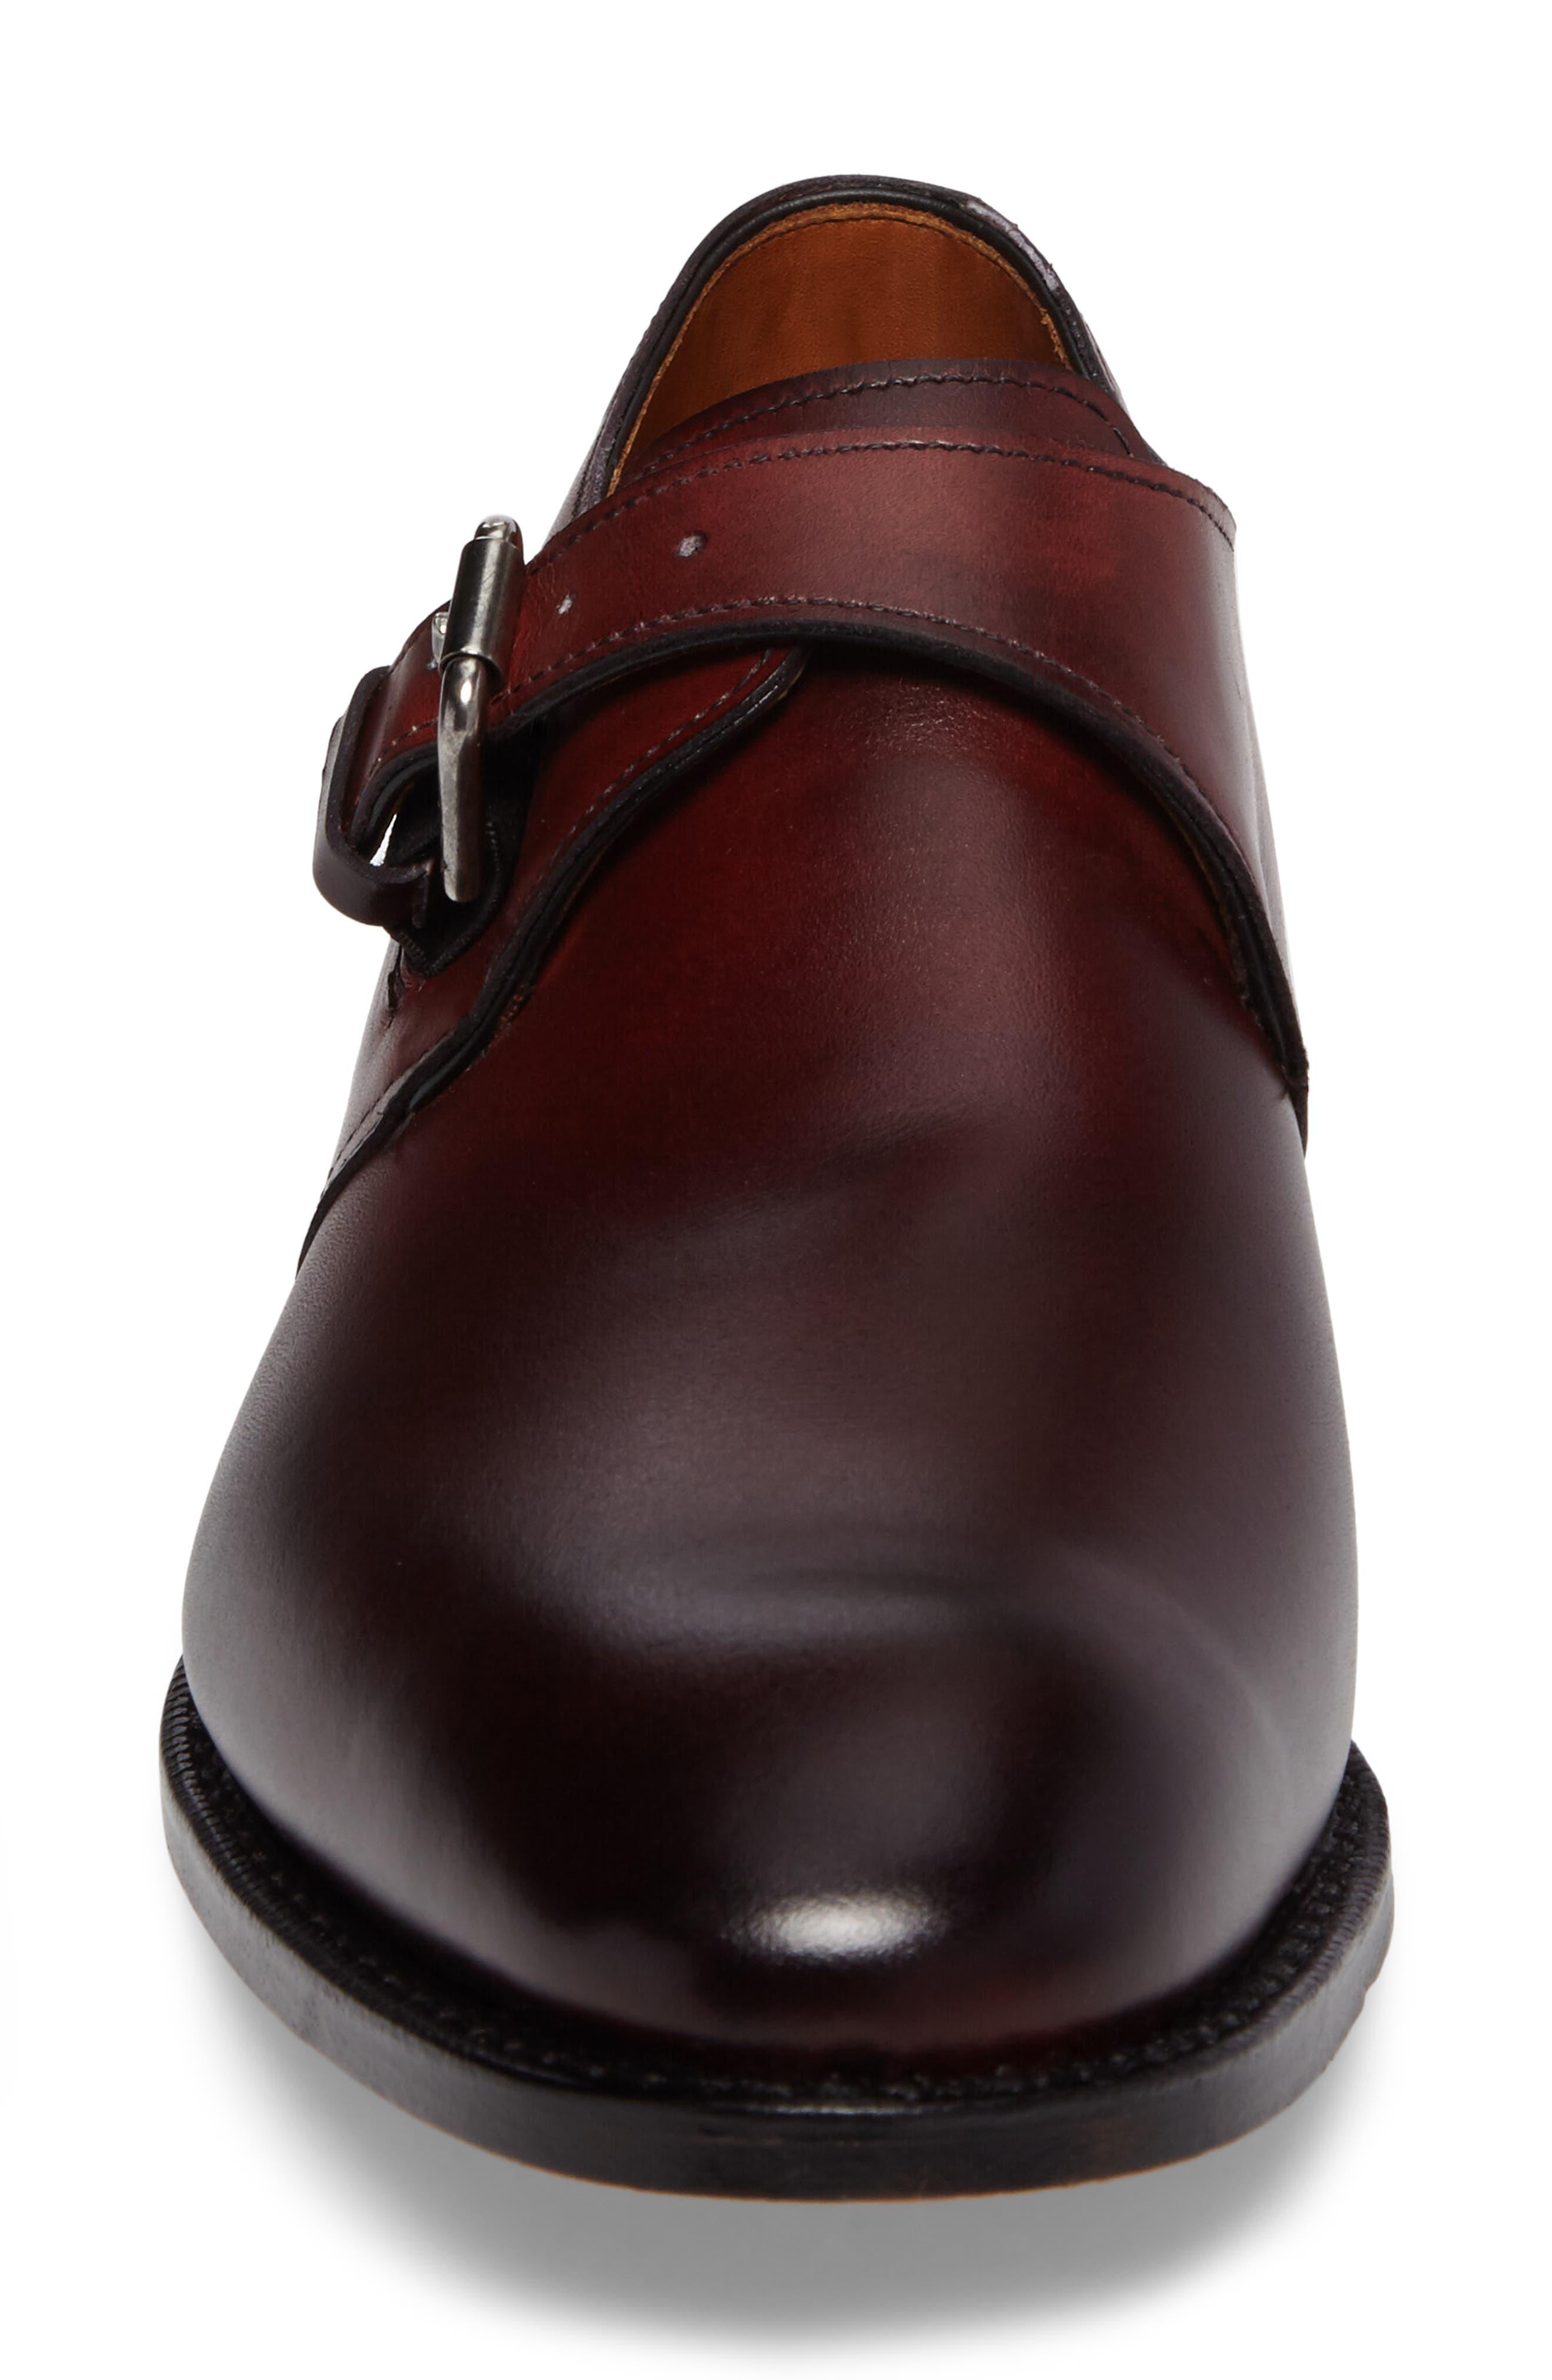 Warwick Monk Strap Shoe,                             Alternate thumbnail 4, color,                             Oxblood Leather